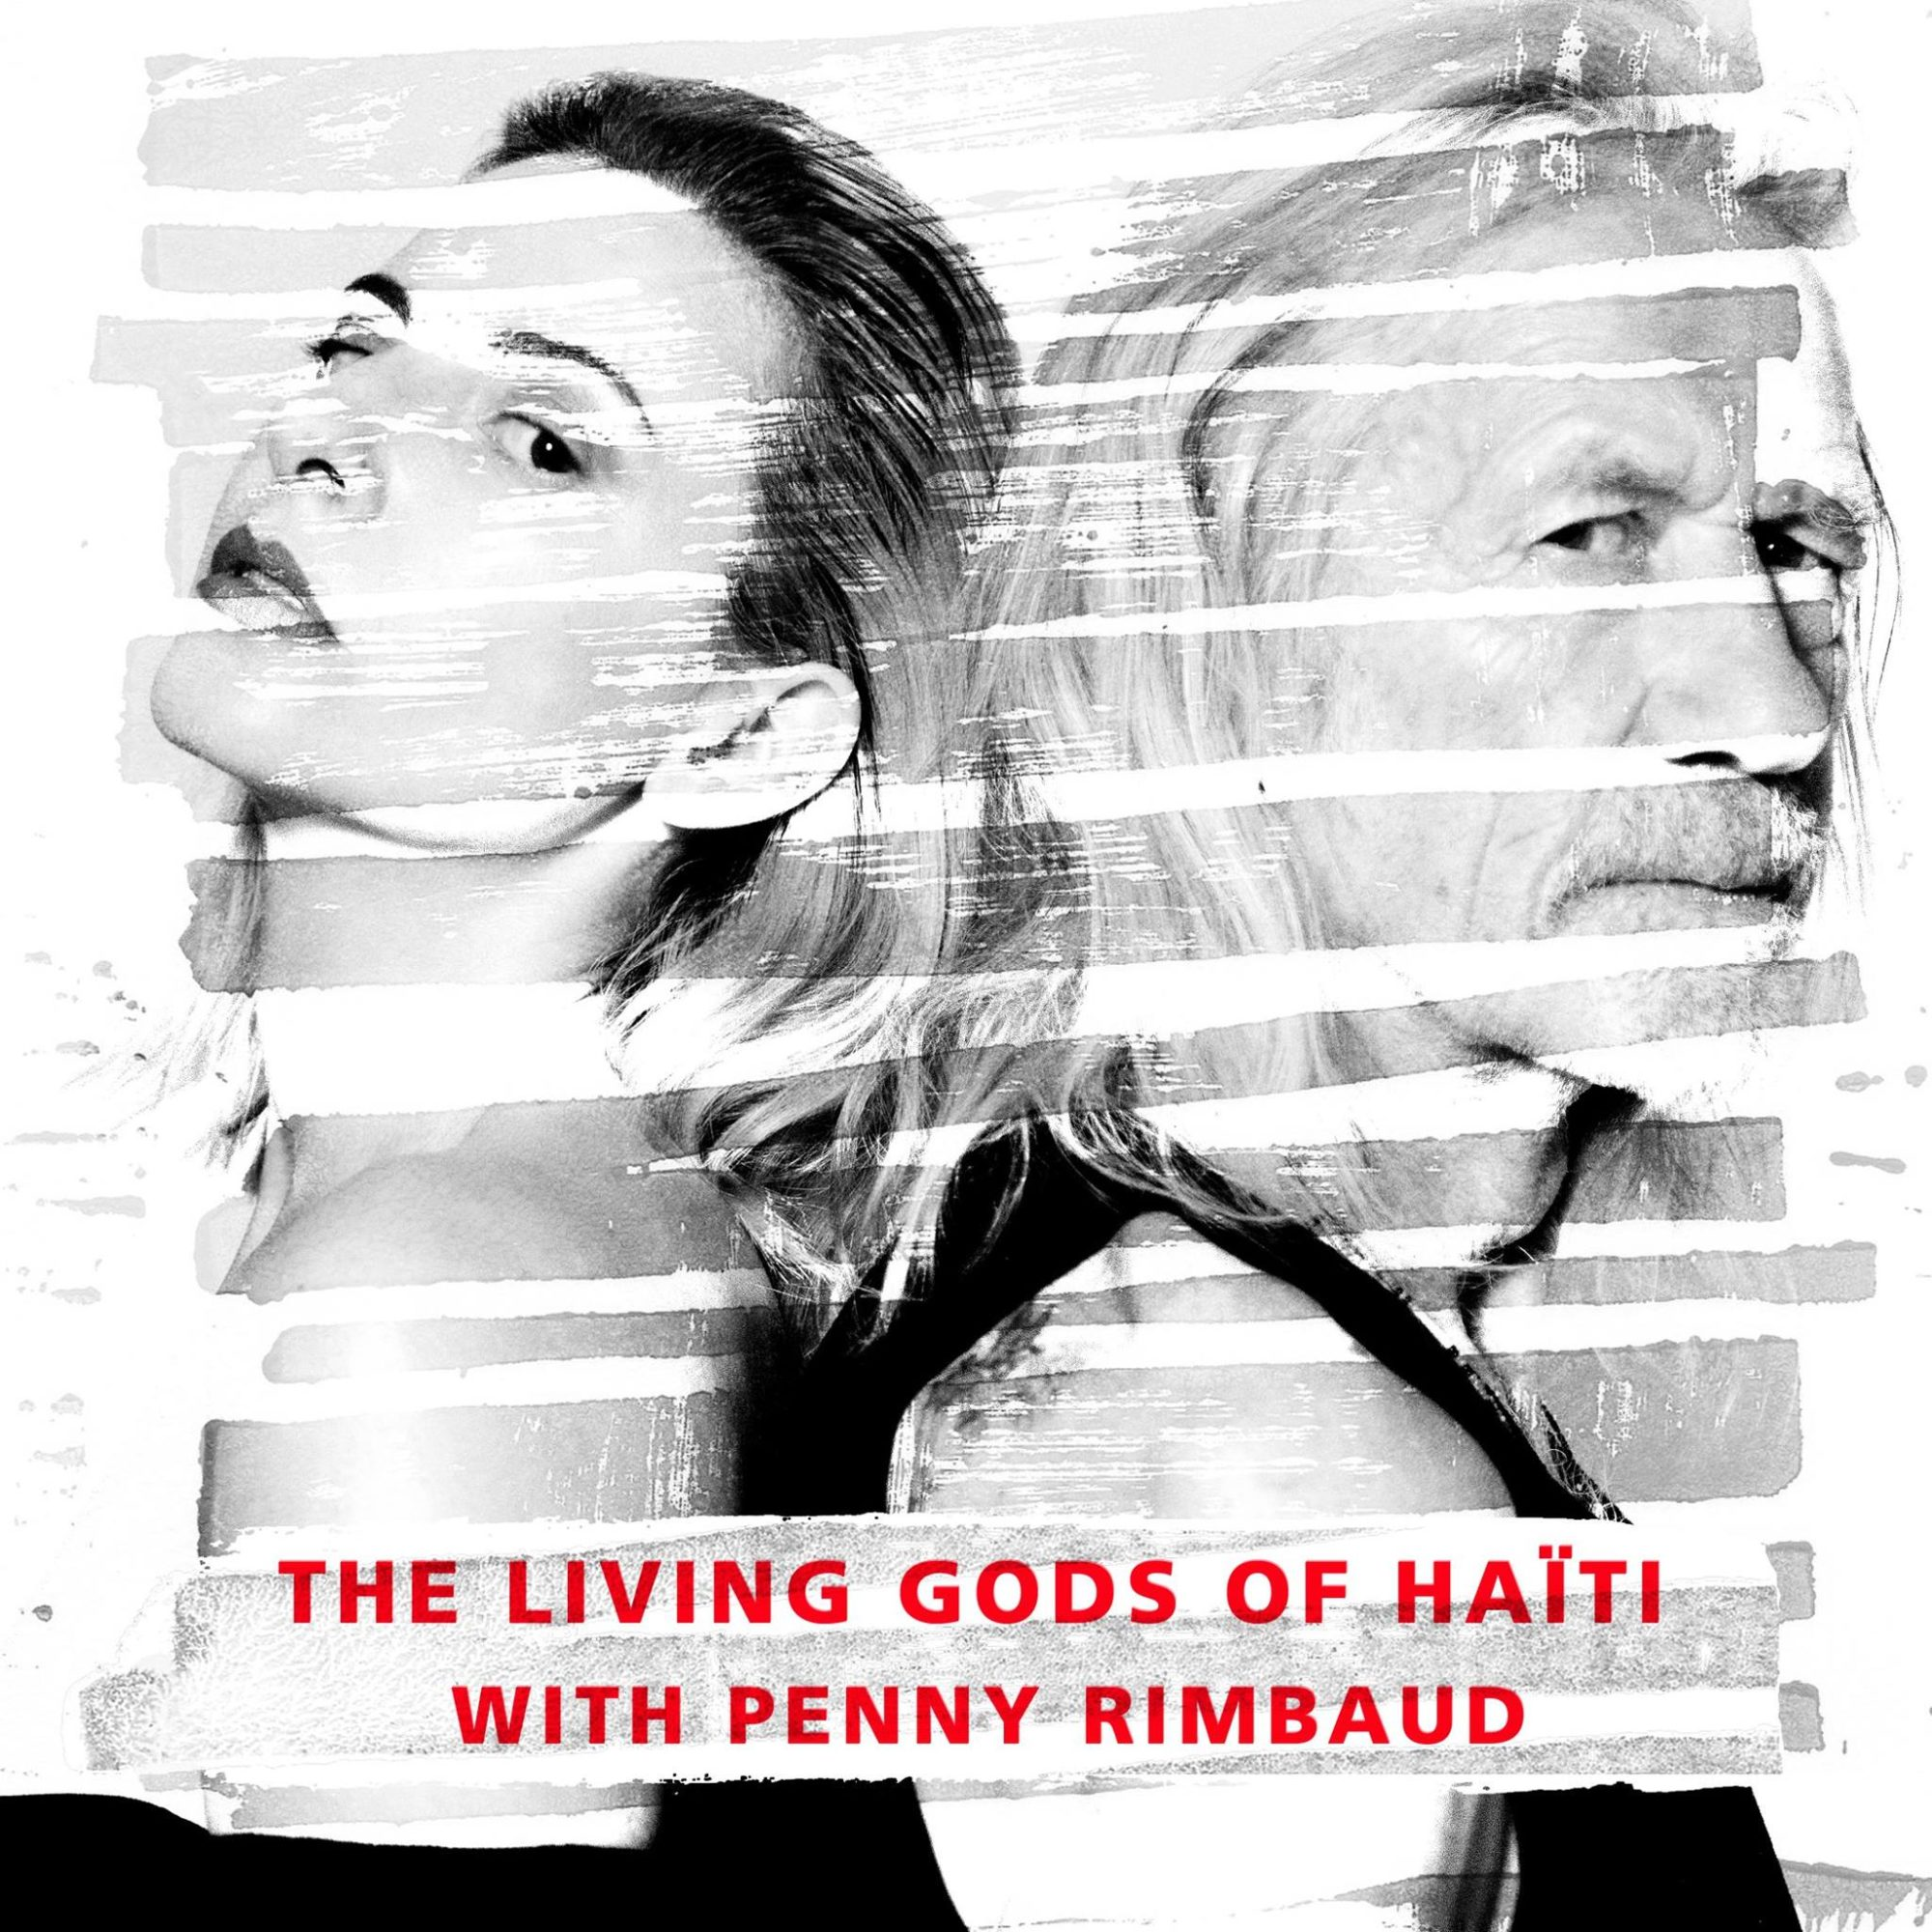 The Living Gods of Haiti and Penny Rimbaud